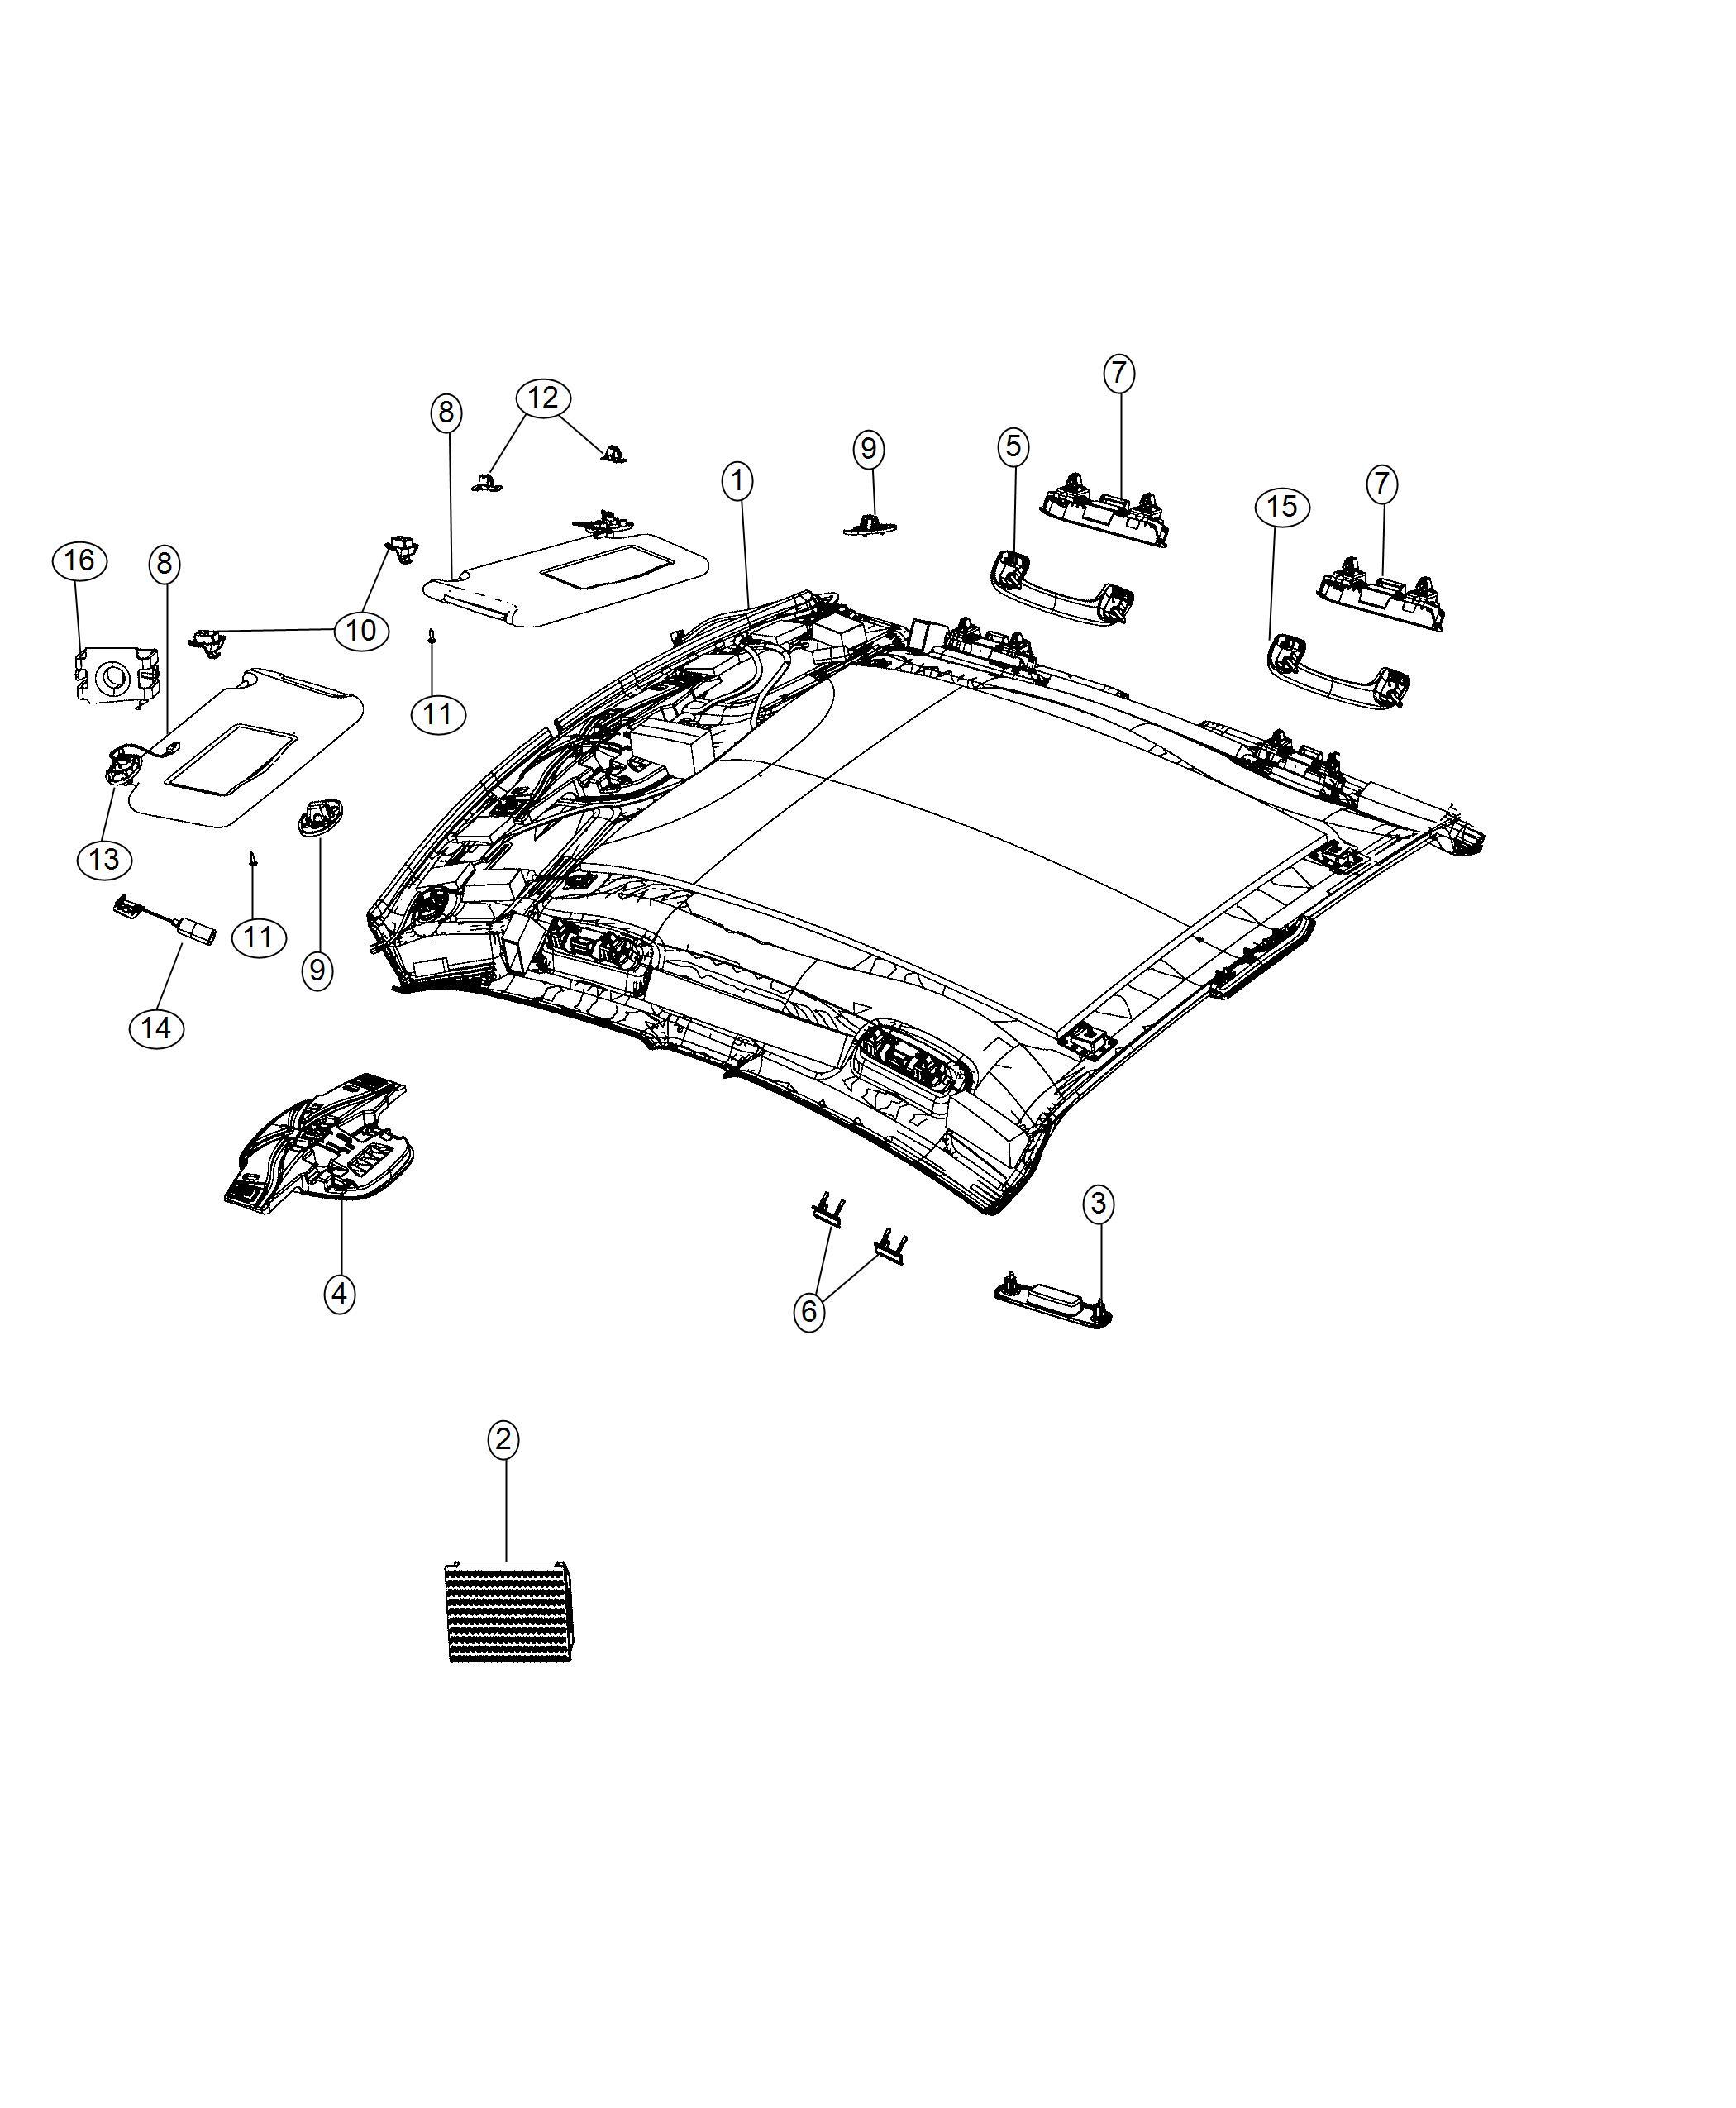 Dodge Charger Visor Illuminated Left Right Trim No Description Available Color